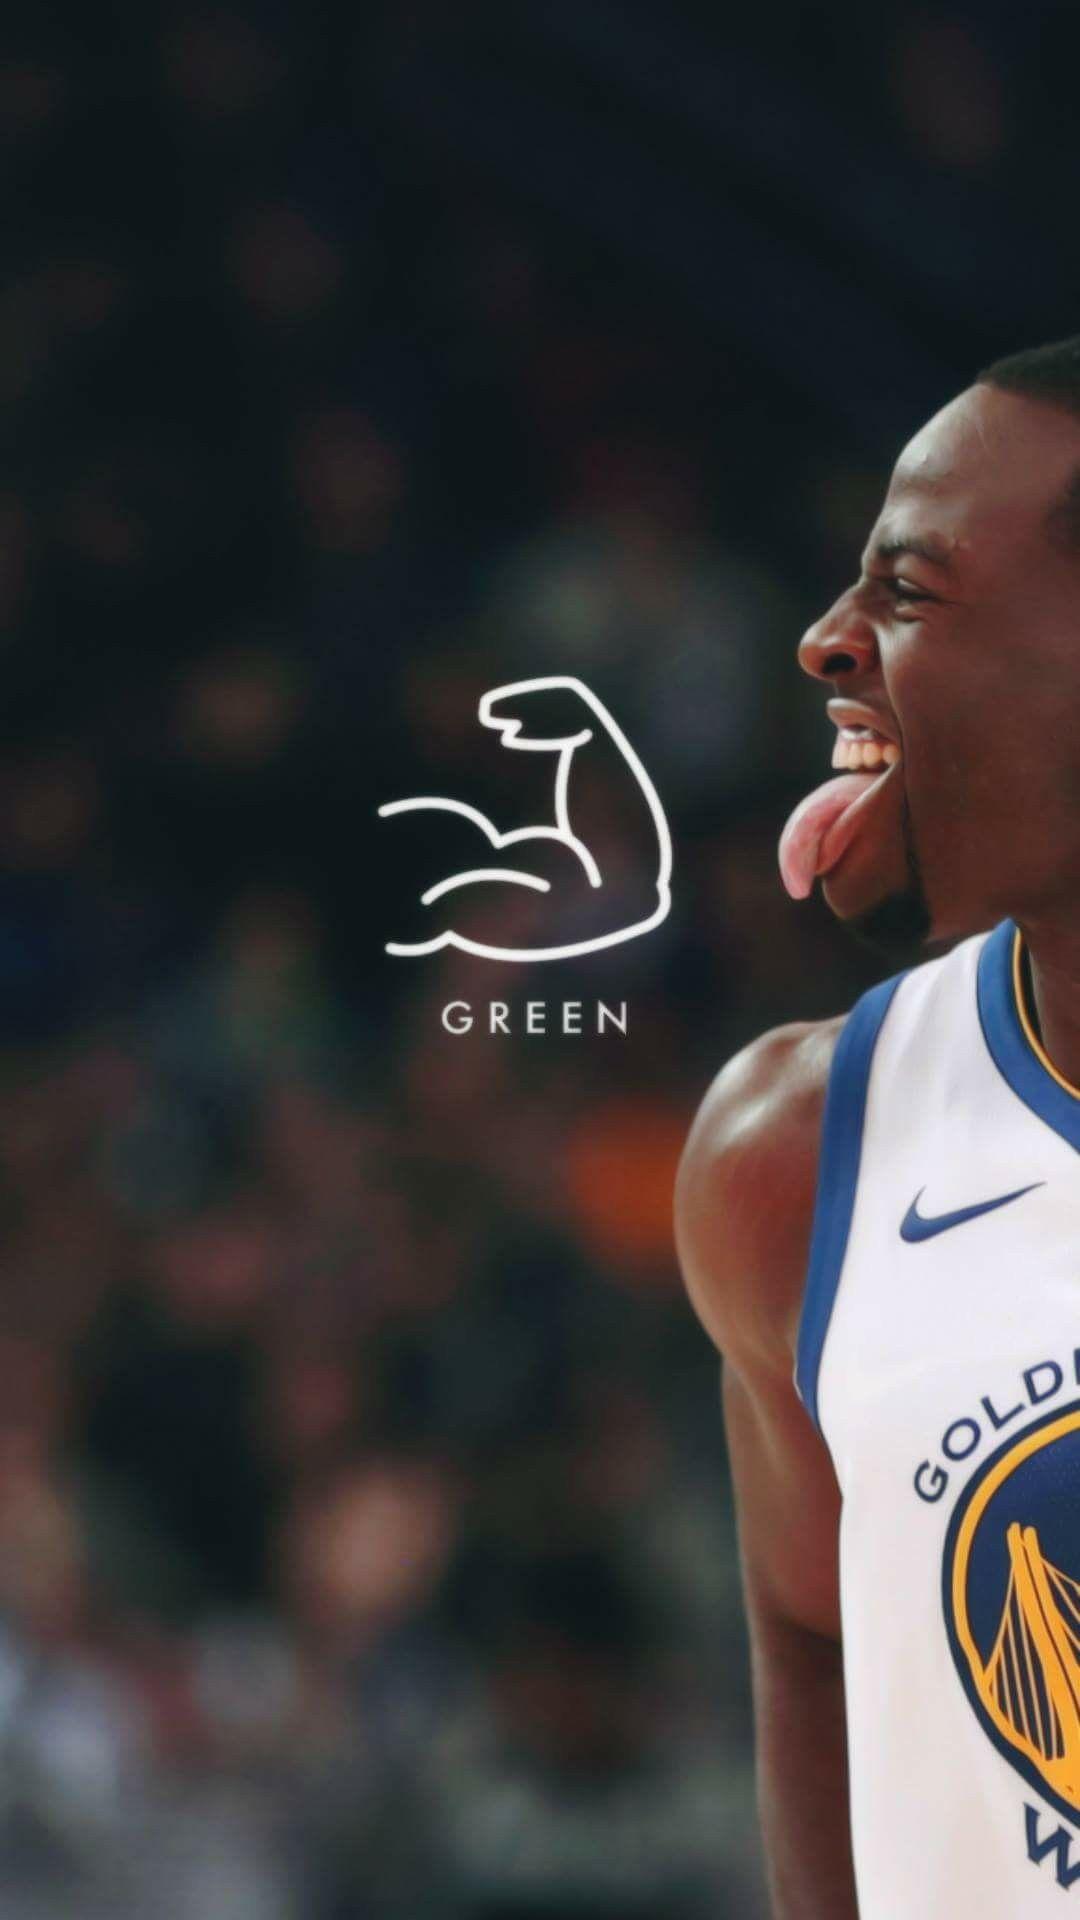 Pin By Caleb Adusei On Golden State Warriors Basketball Players Nba Draymond Green Warriors Basketball